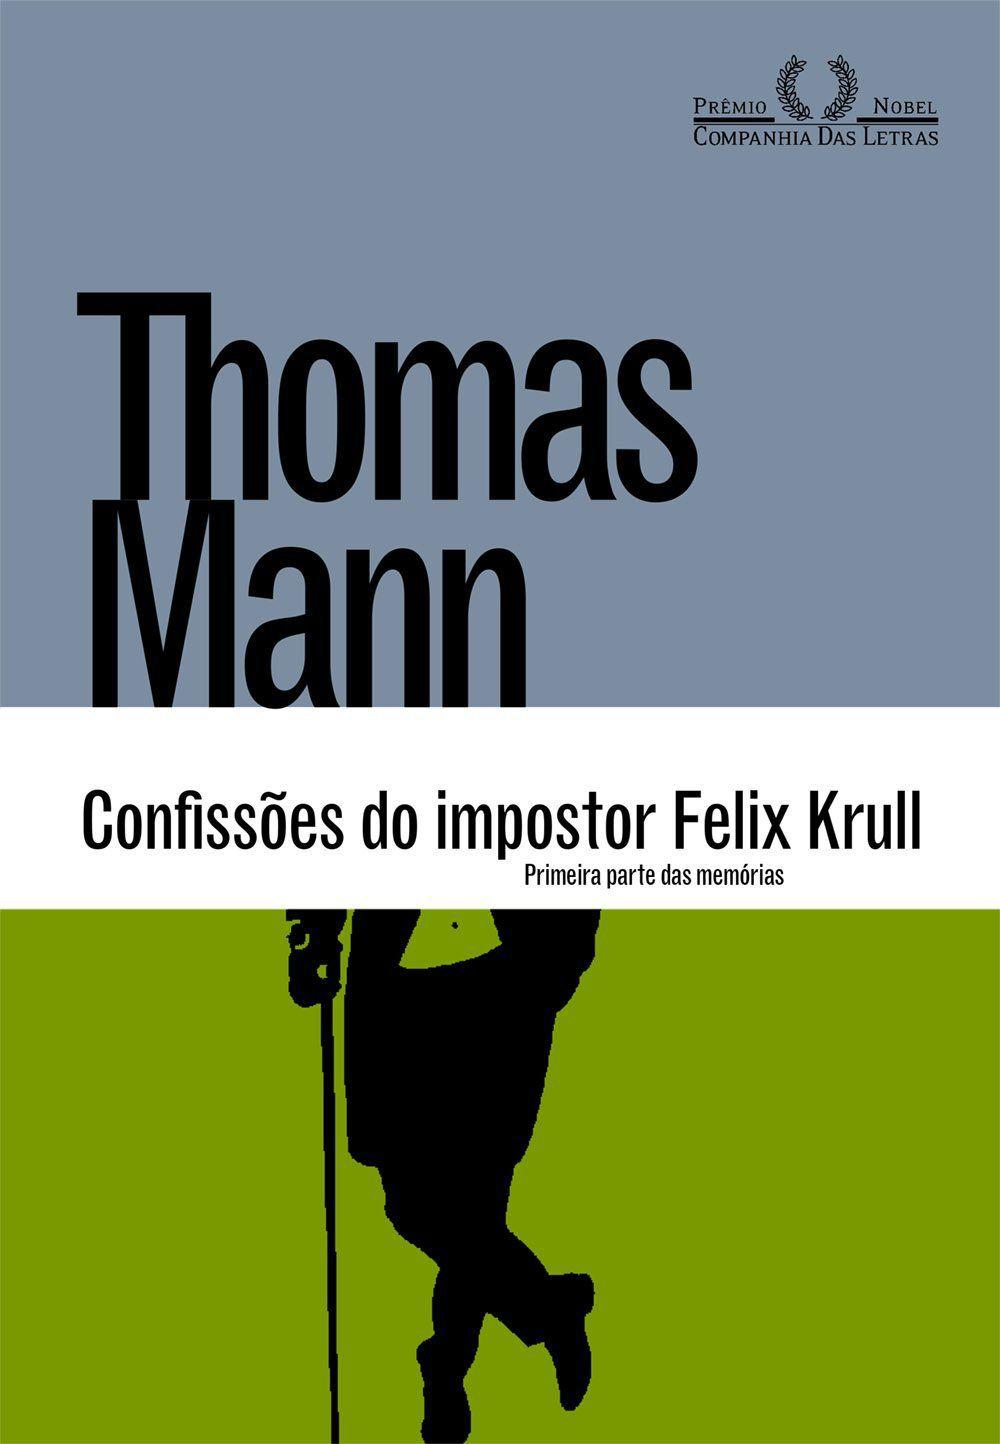 Confissões do impostor Felix Krull